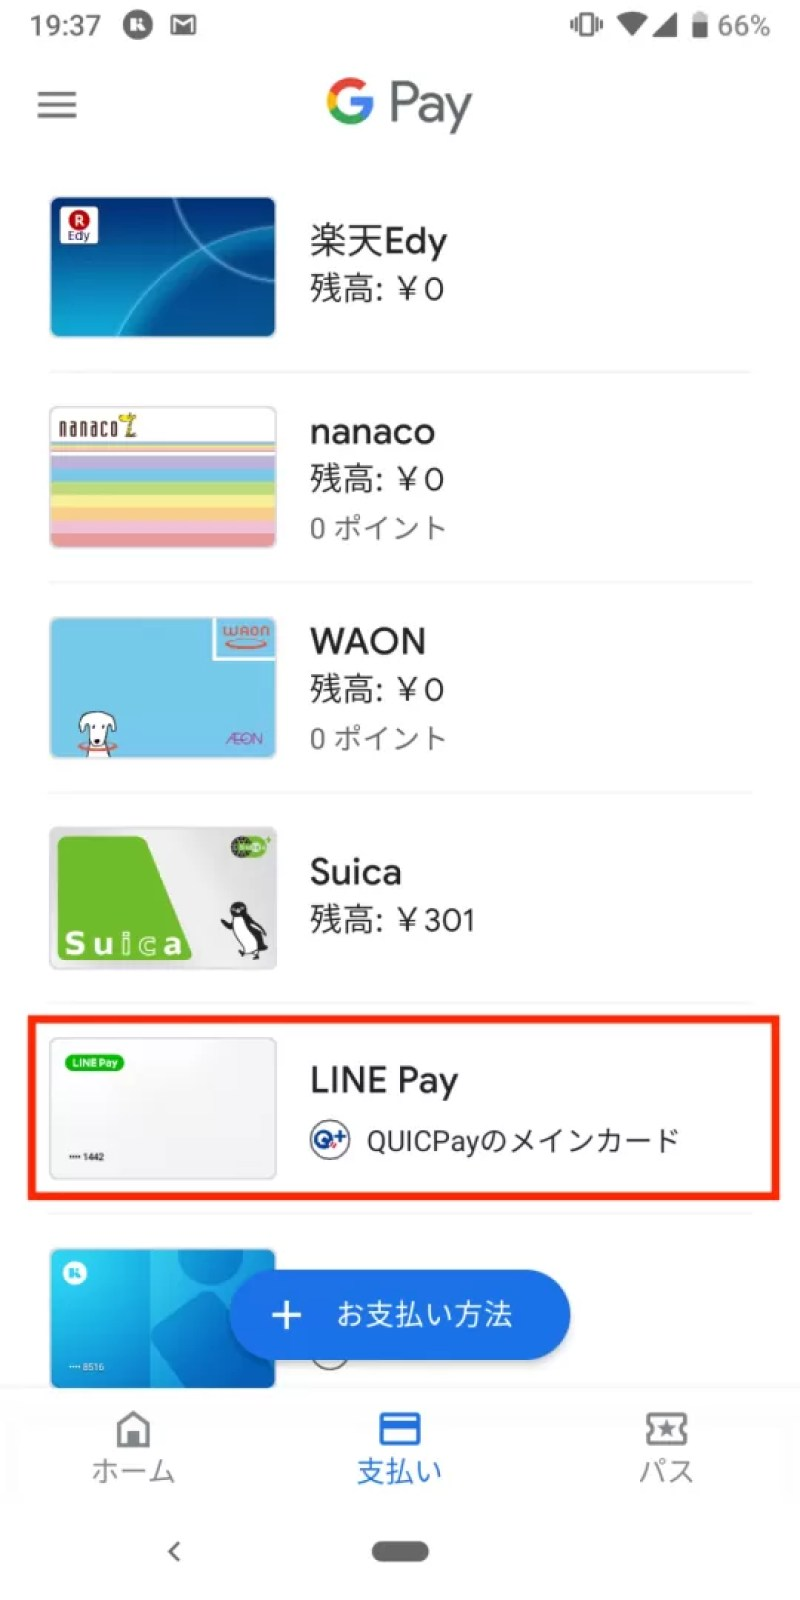 Google PayにLINE Payカードが登録された